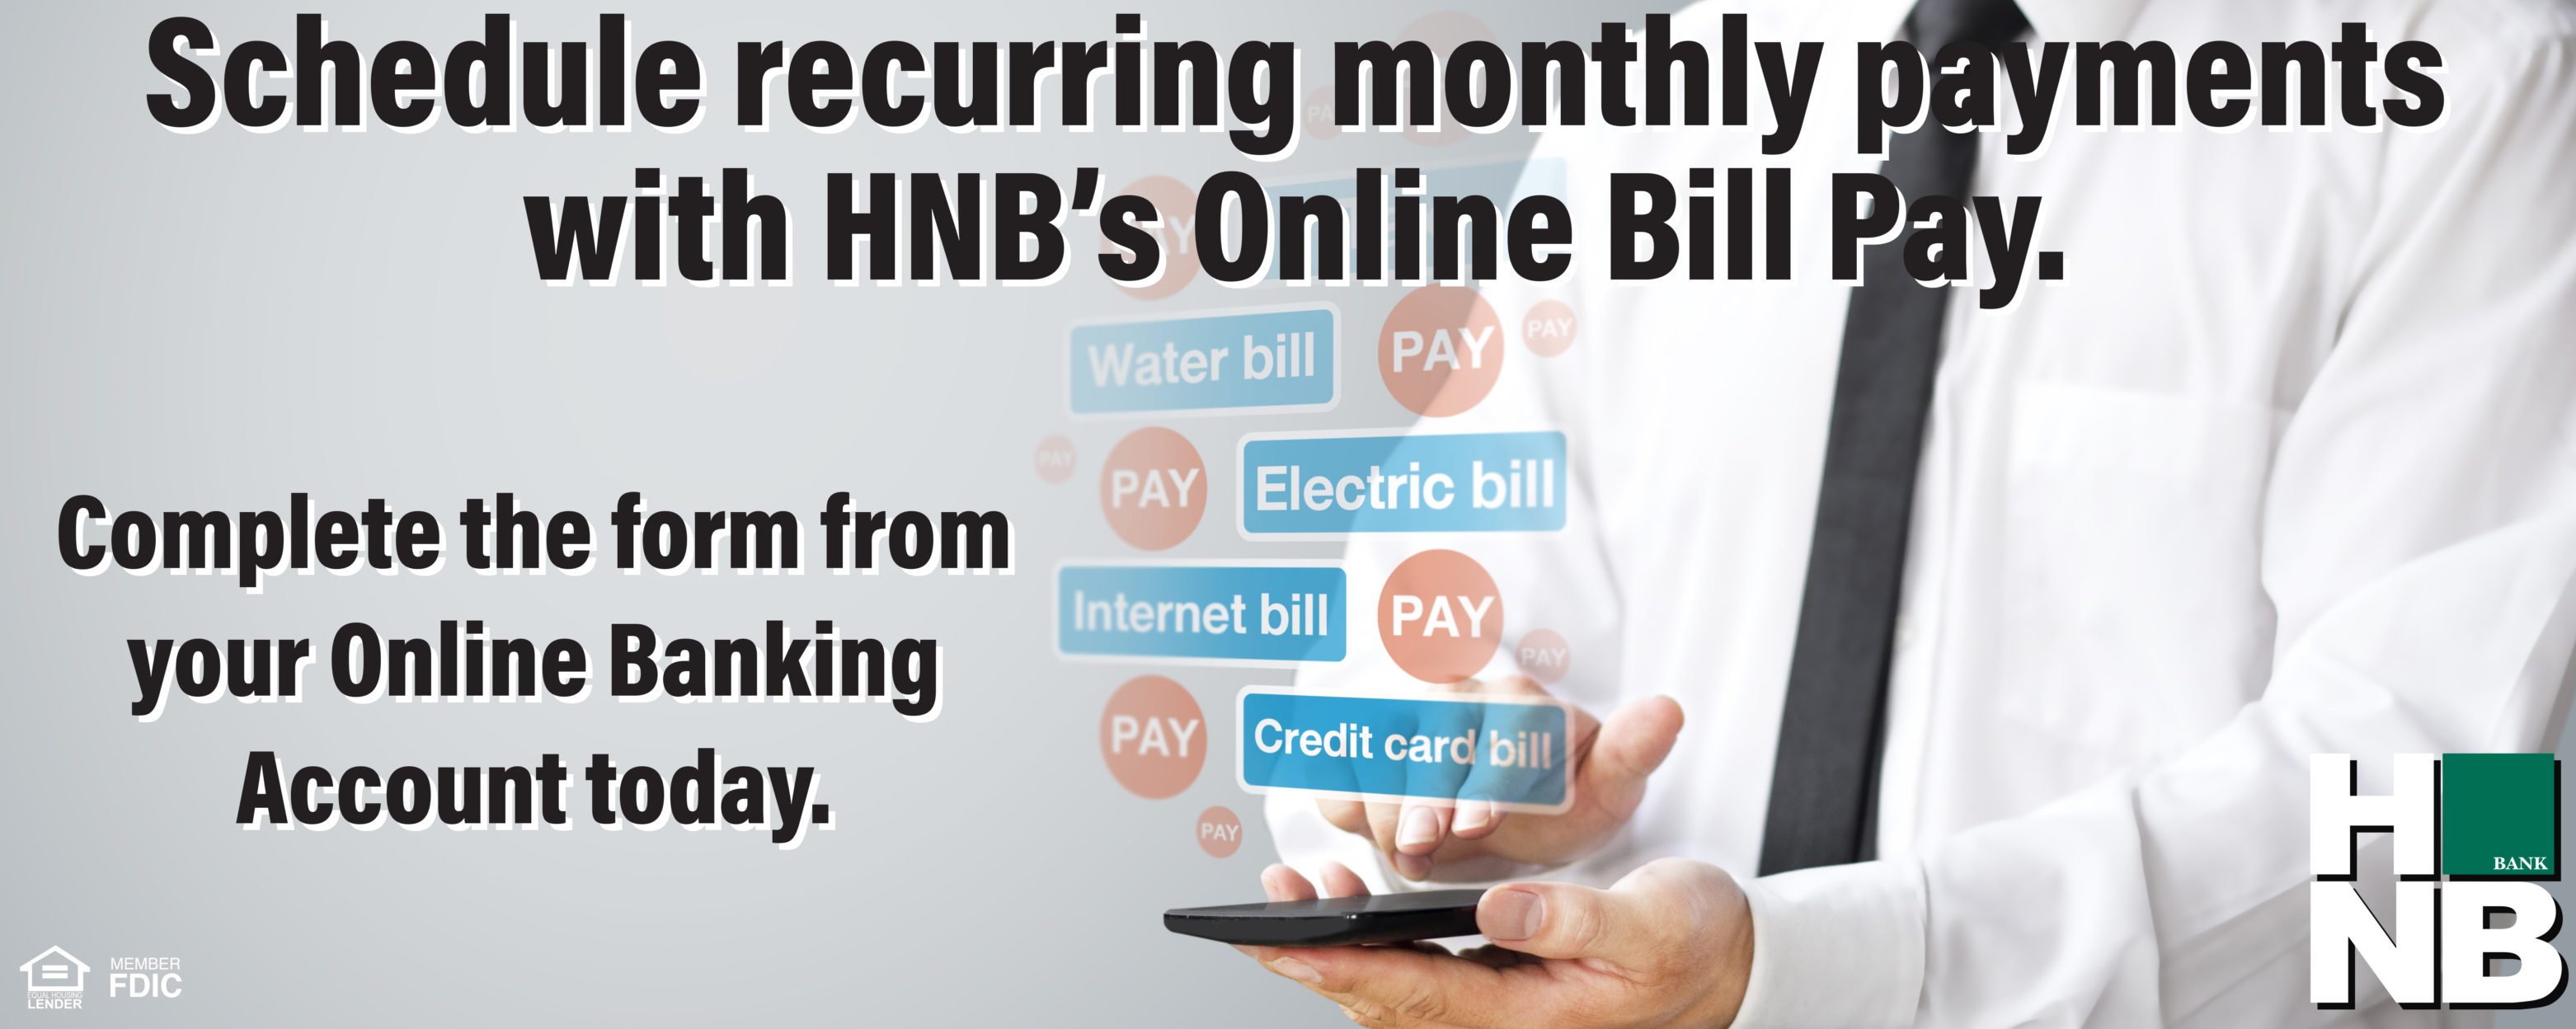 Hnb Banks